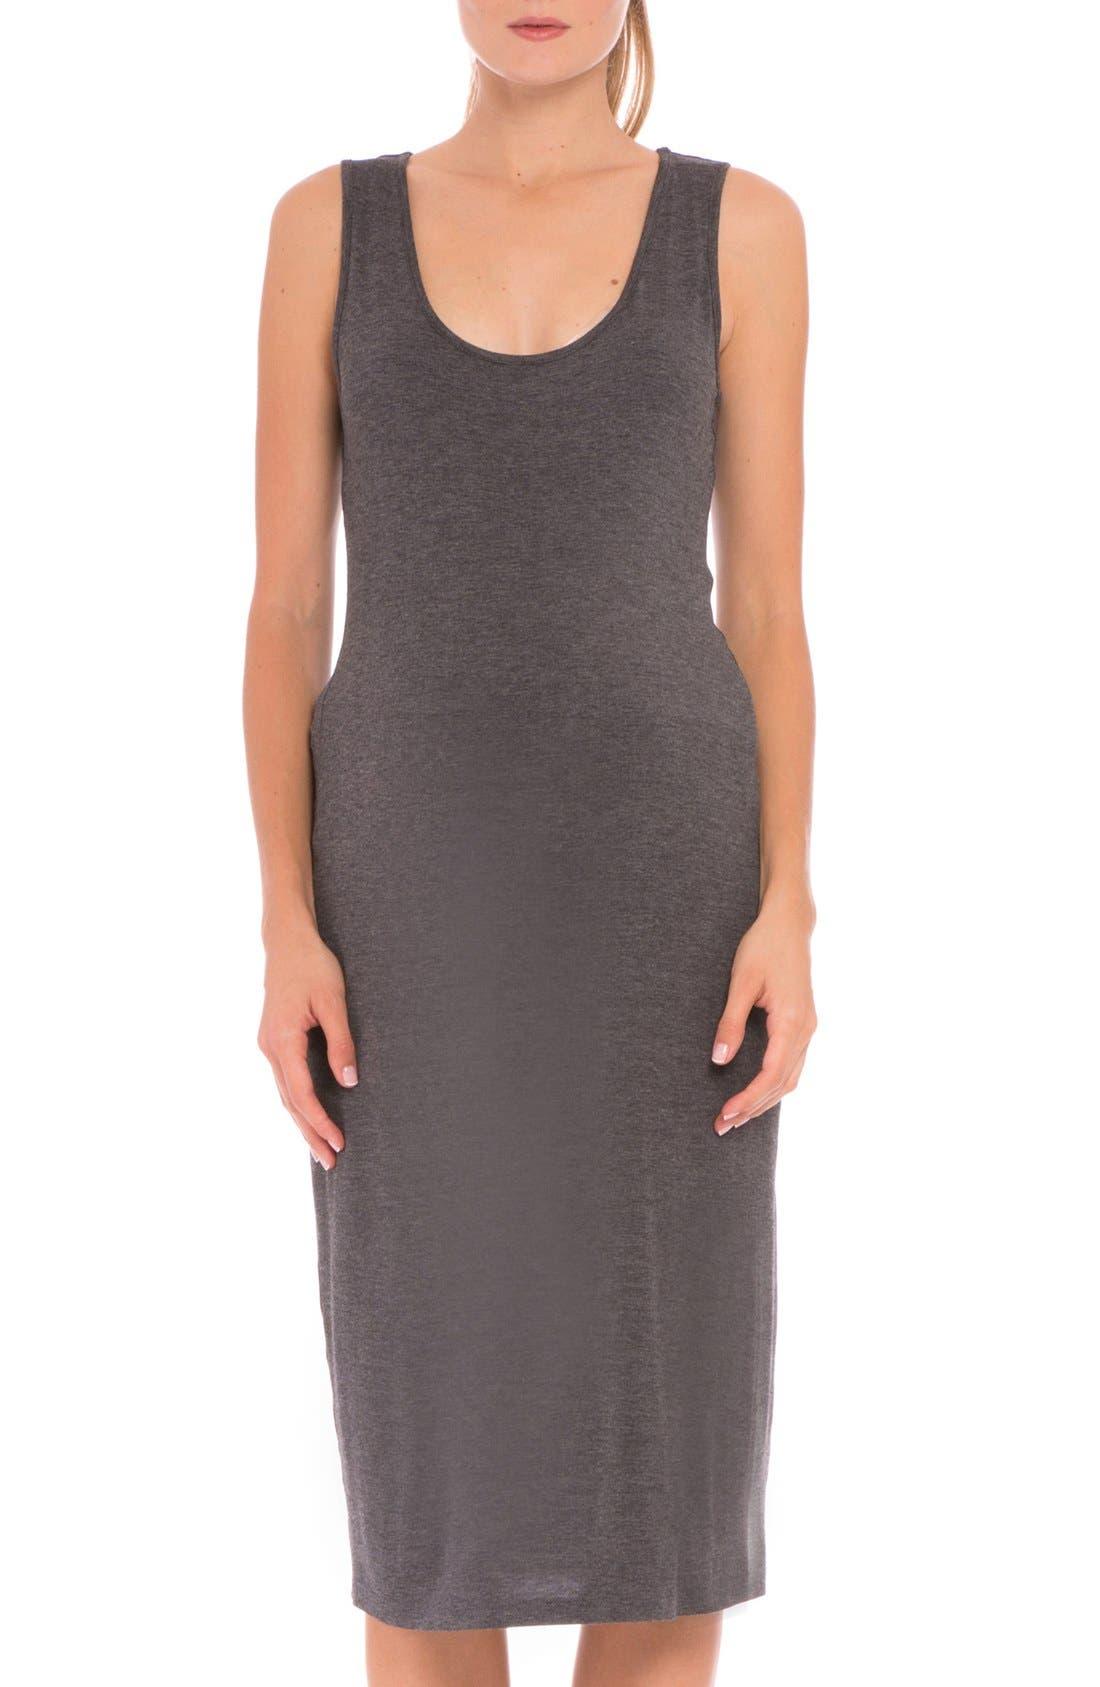 OLIAN 'Olivia' Reversible Maternity Tank Dress